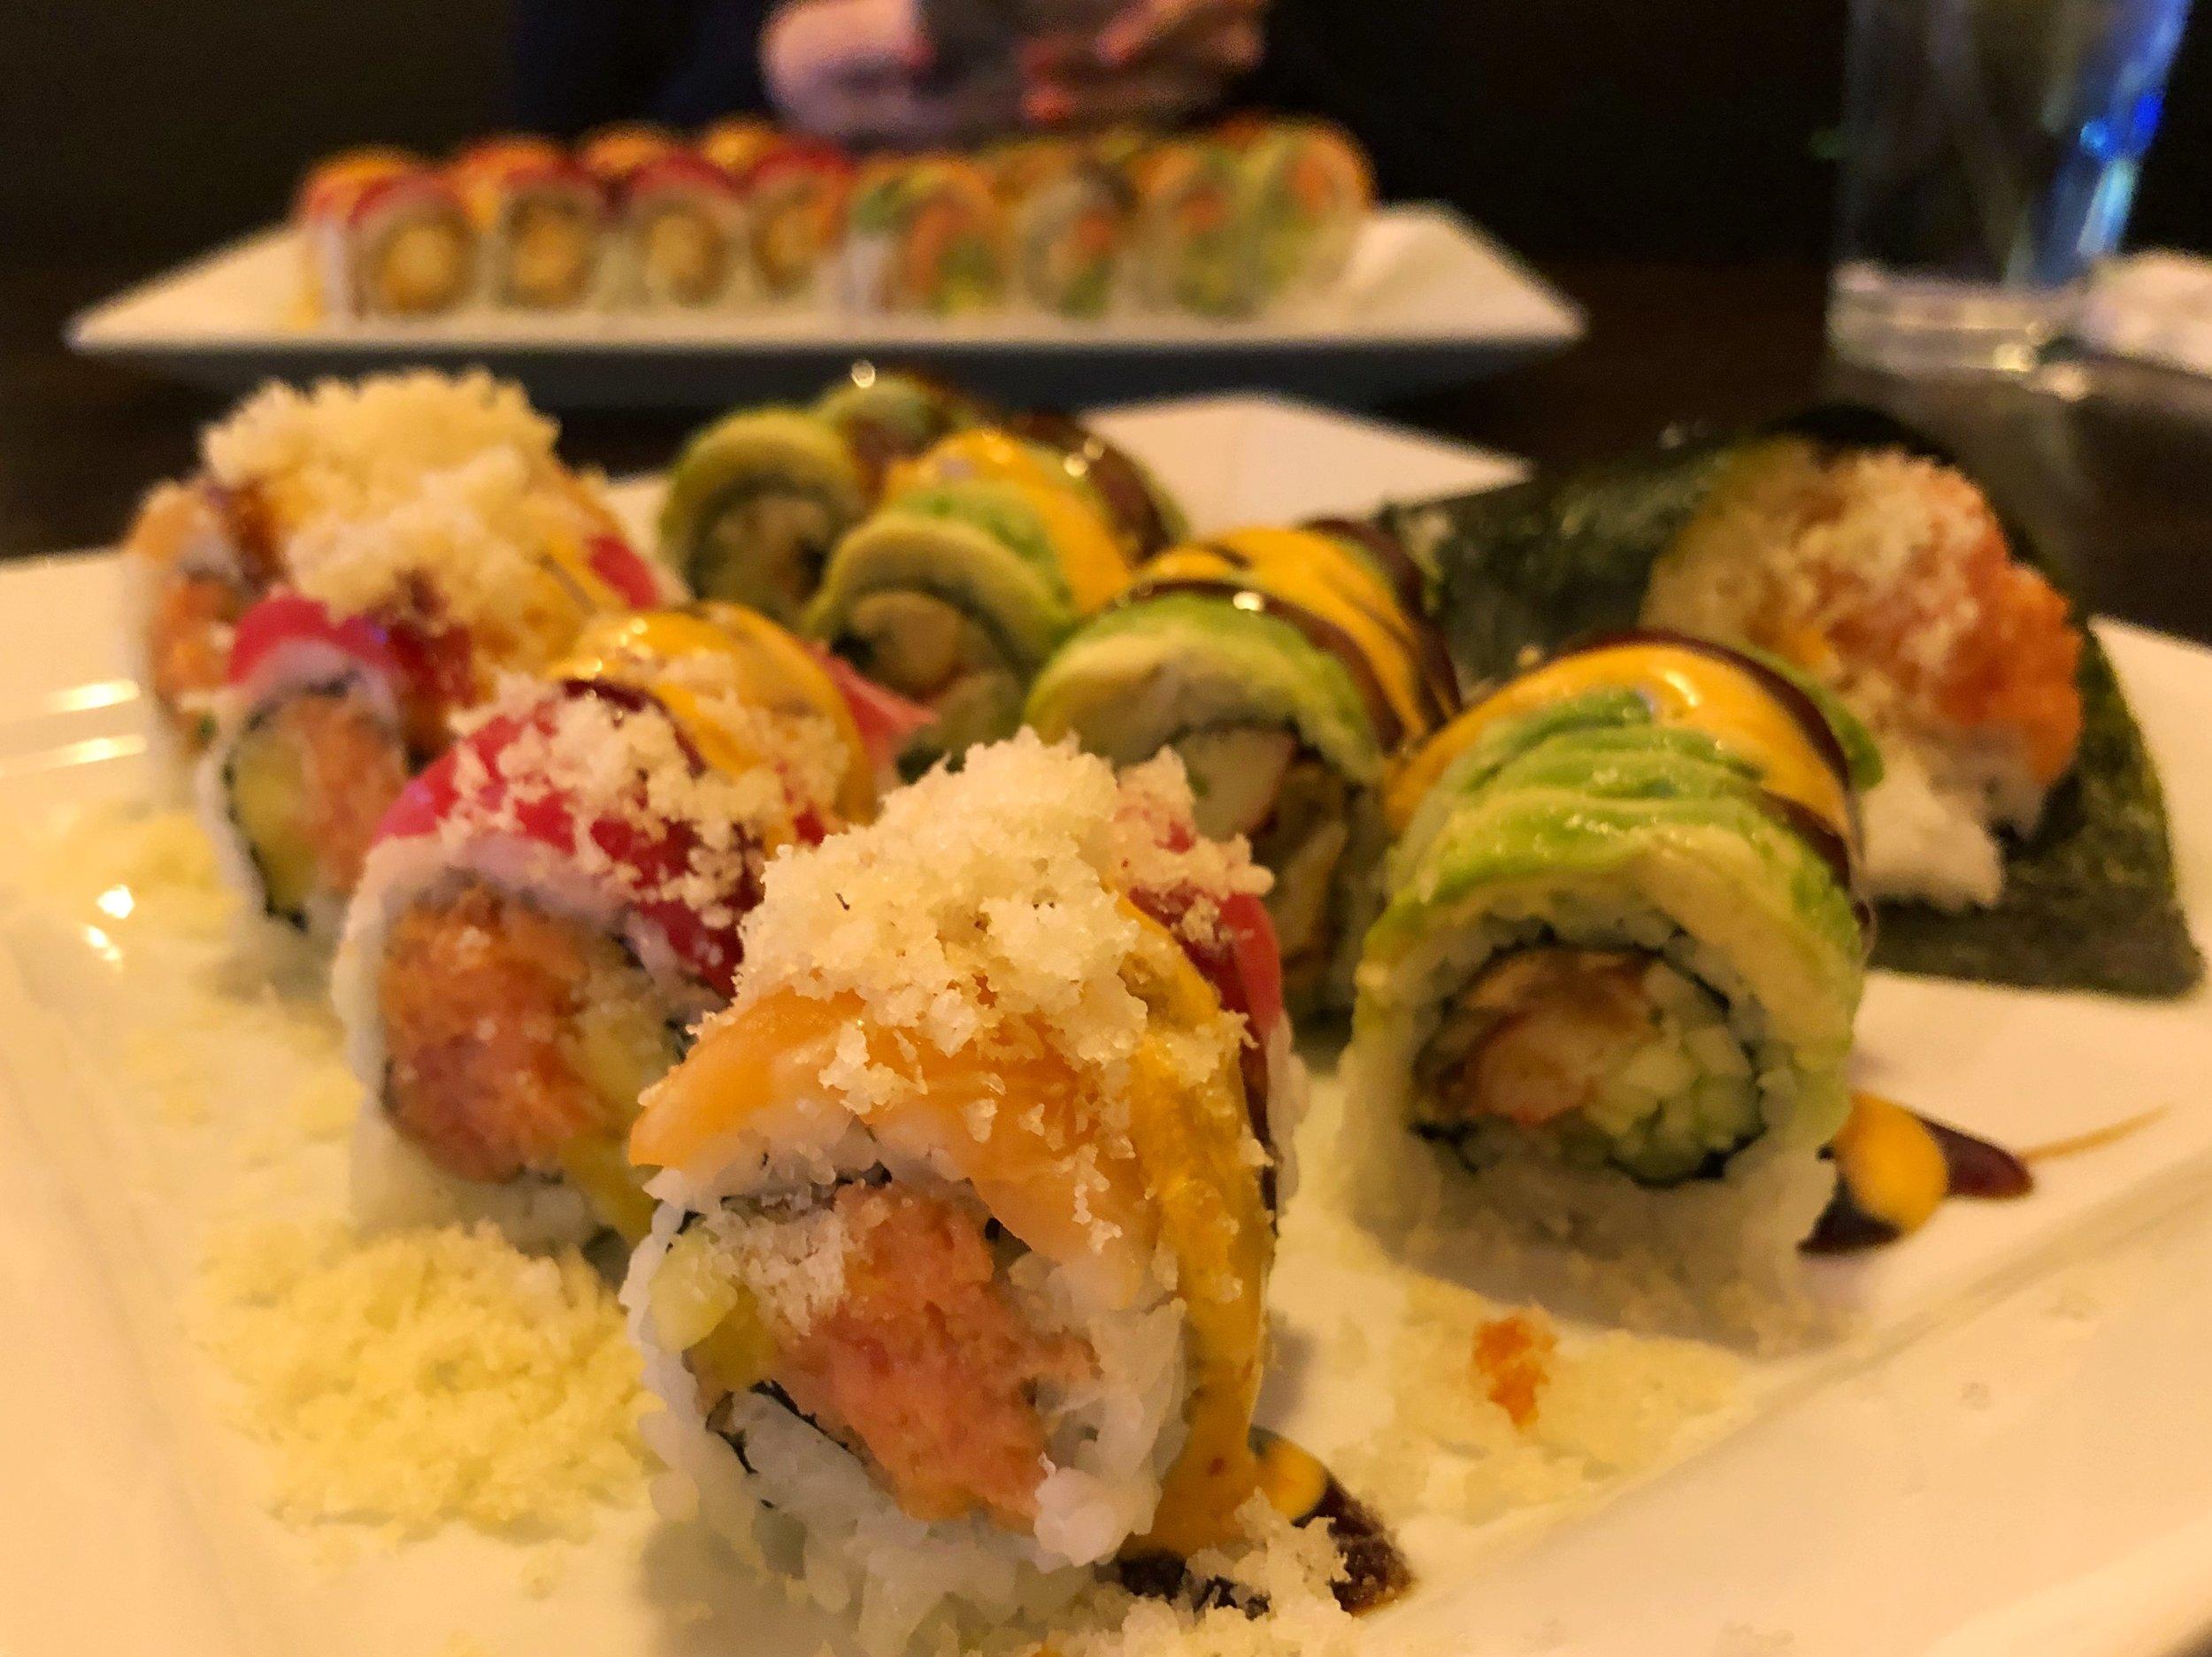 Tiger Roll | Spicy Tuna, crunch, mango with tuna, salmon, crunch, masago on top  Dragon Roll | Eel, cucumber, crabmeat with sliced avocado on top, eel sauce  Spicy Tuna Hand Roll